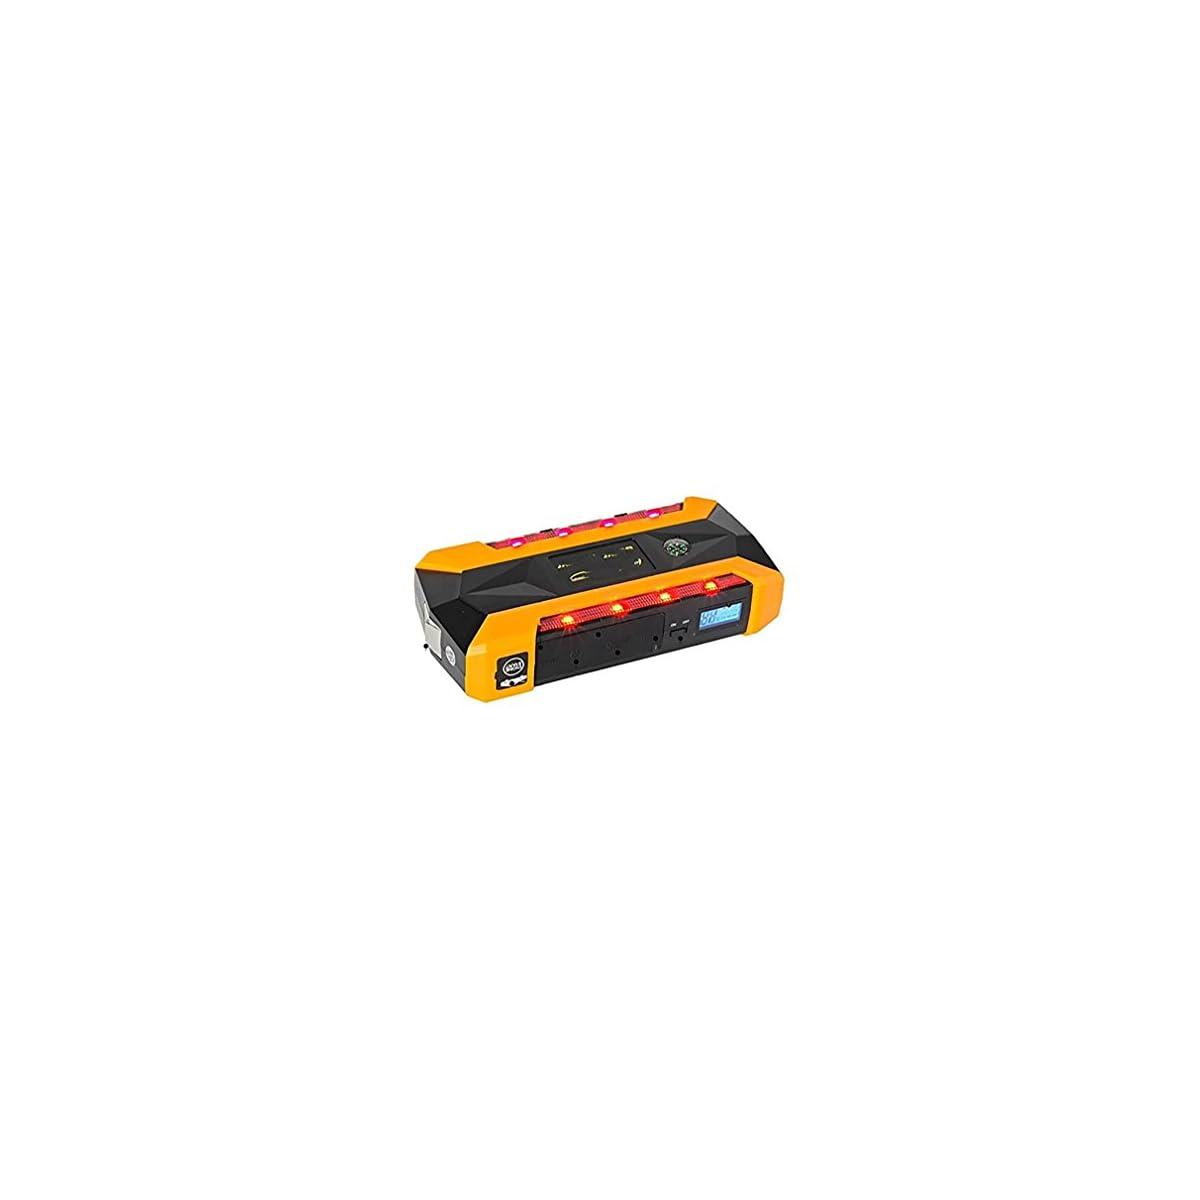 415MycsrGfL. SS1200  - WJJ- 600A Peak 22000mAh arrancador portátil de salto de coche, batería de emergencia Booster Pack, banco de energía inteligente con linterna LED, pantalla LCD y brújula